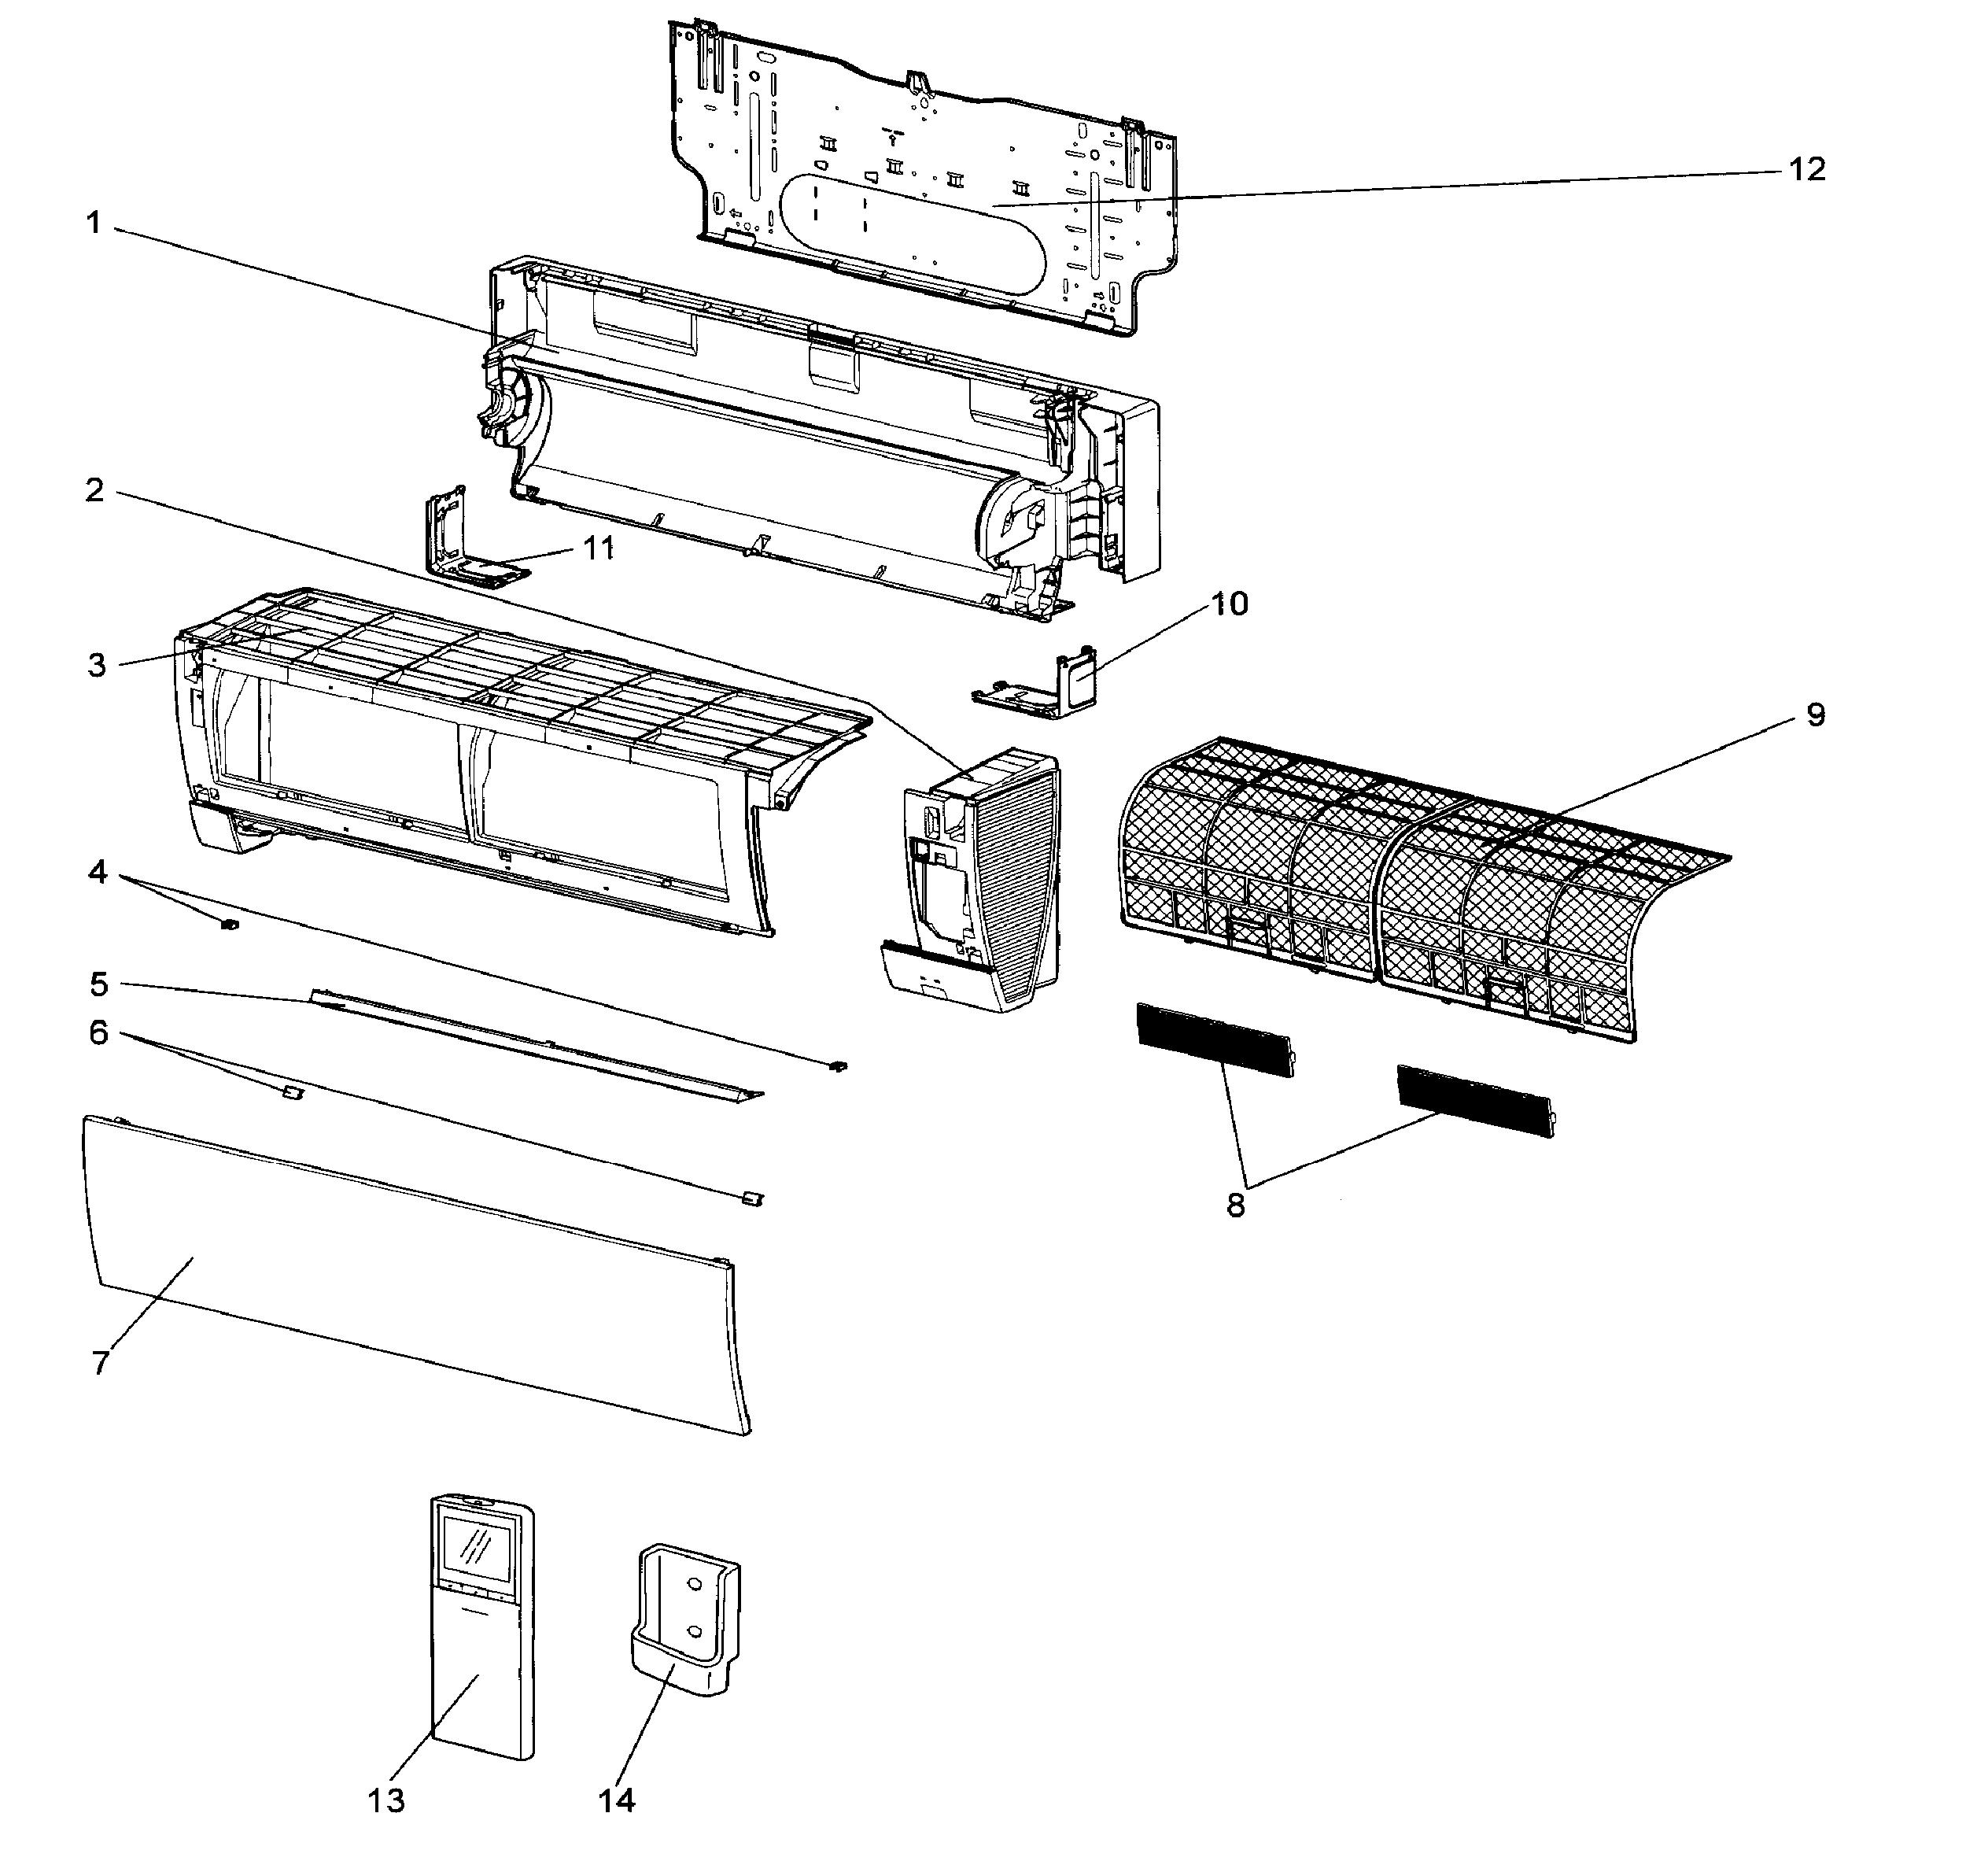 Mitsubishi model MSZ-FH12NA air handler (indoor blower